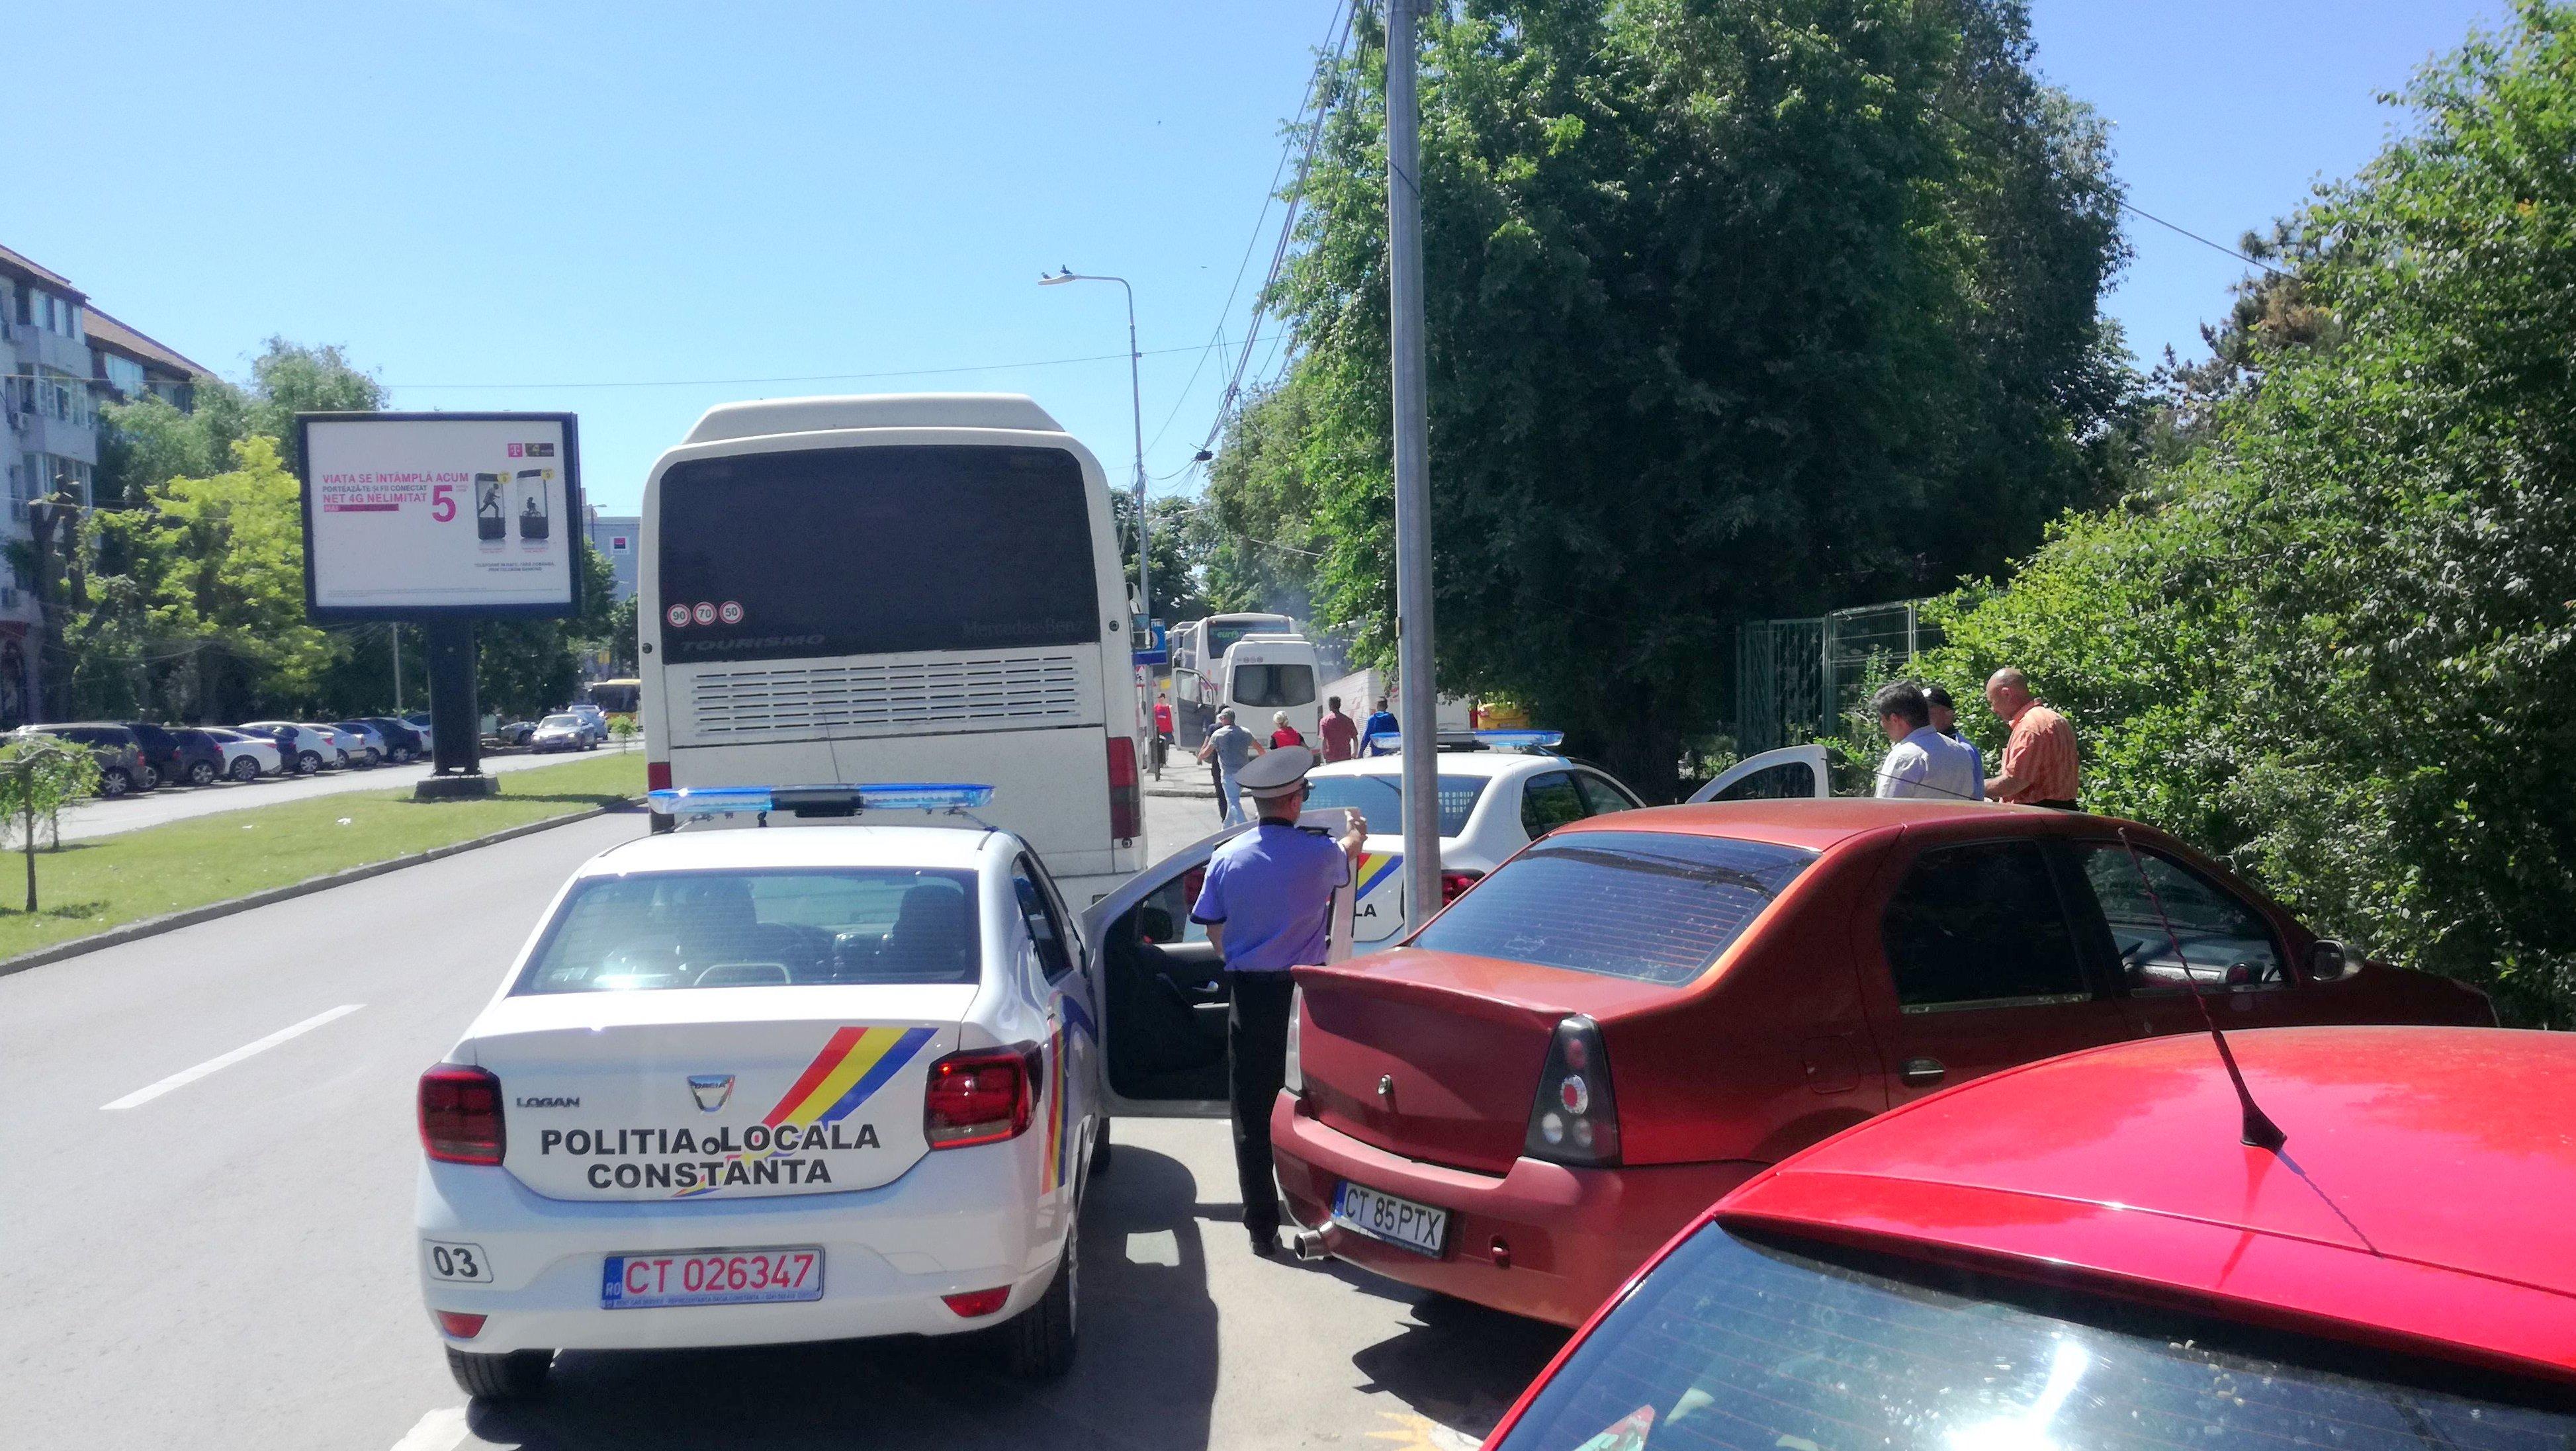 DGPL Politia Locala Constanta